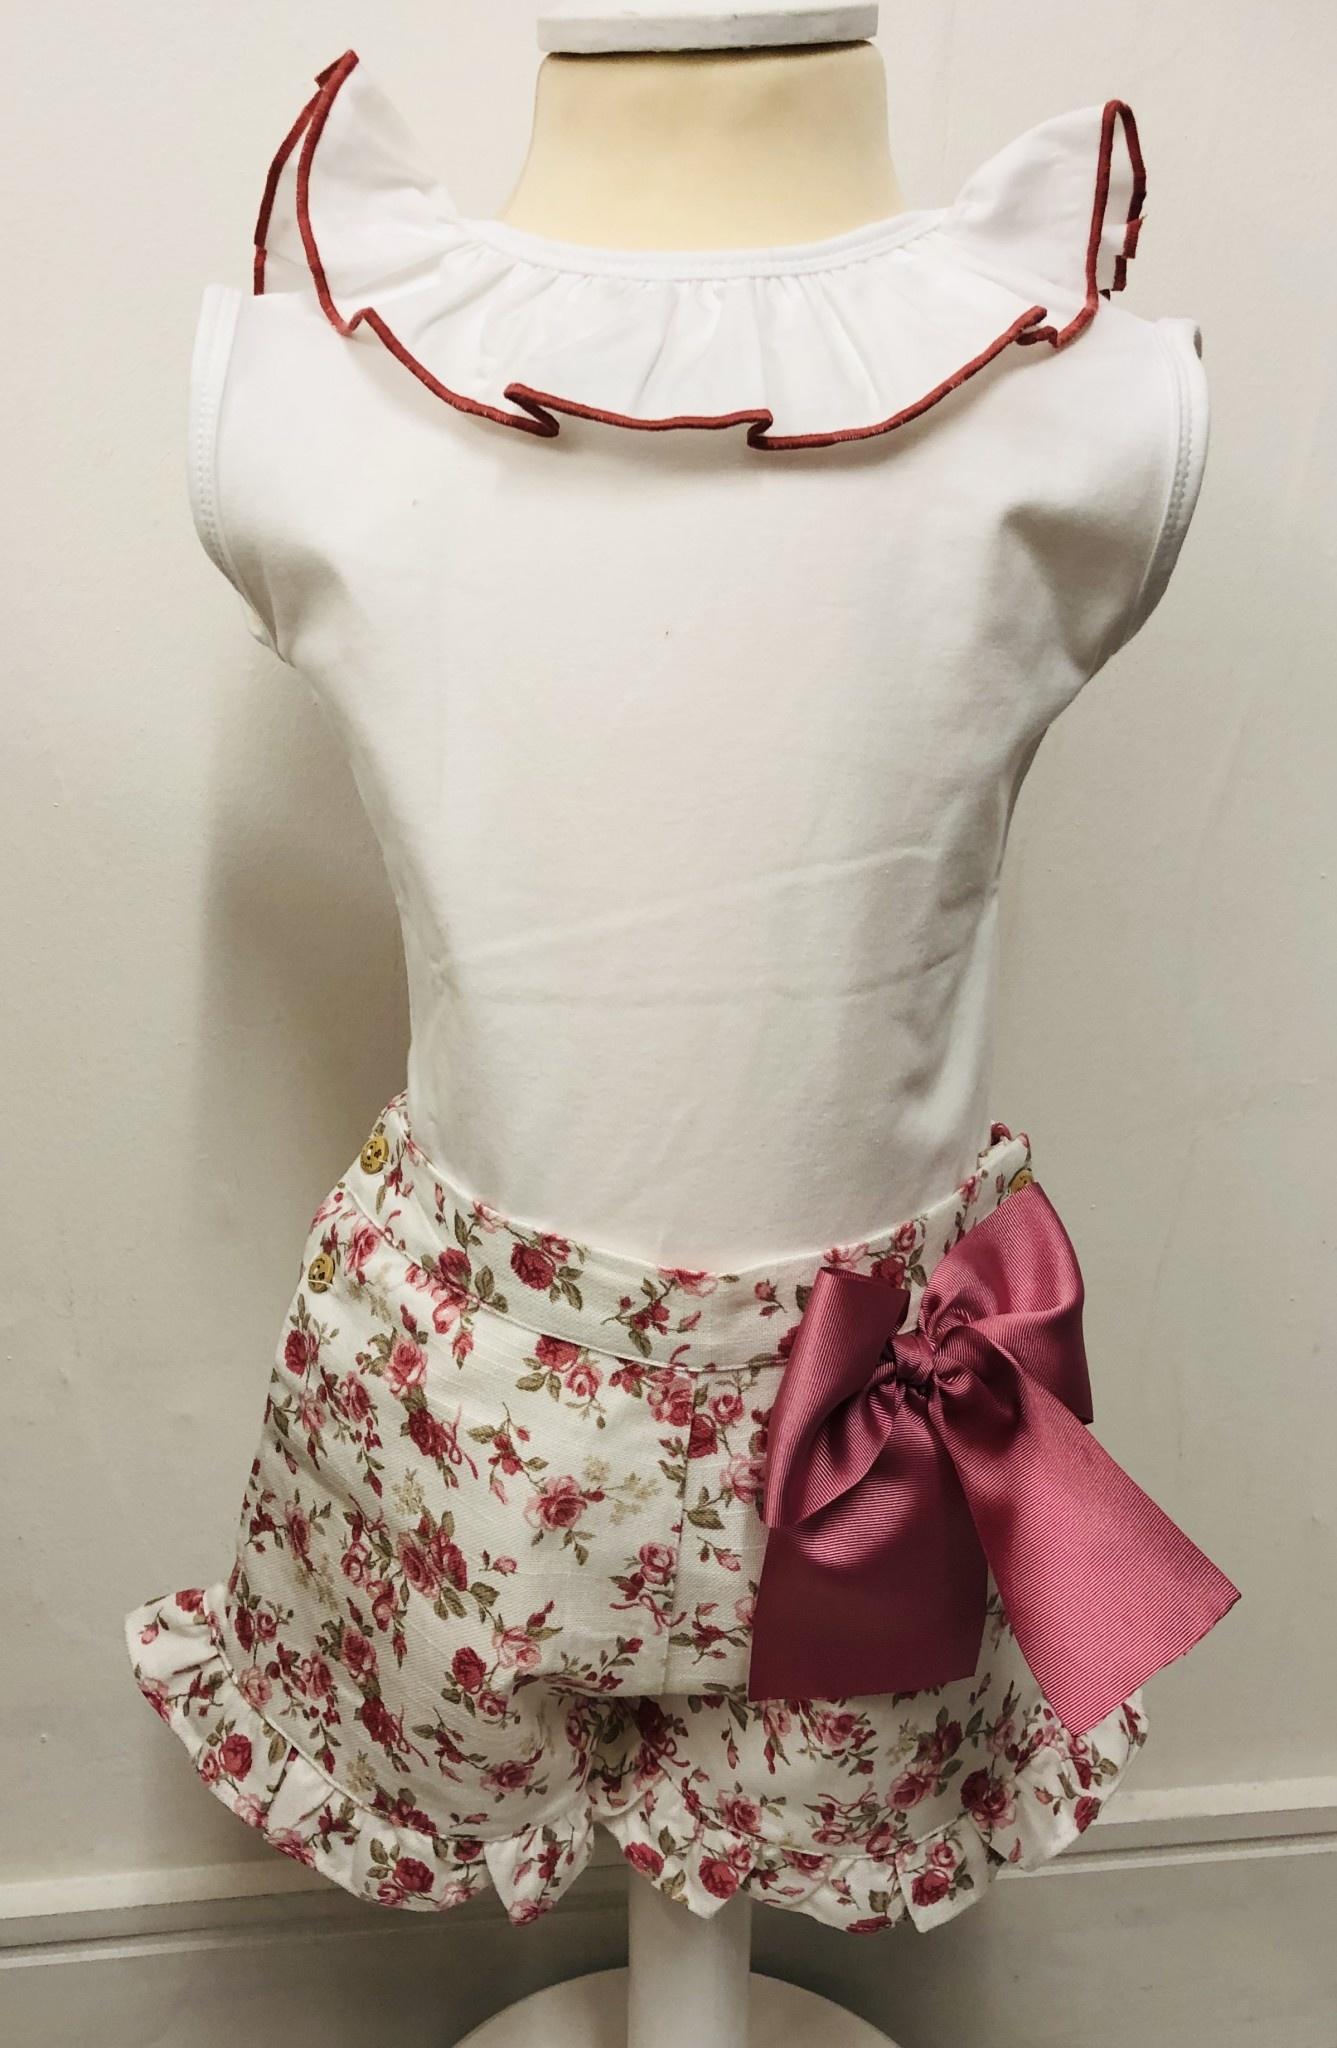 Bogoleta Bogoleta Rose Top & Short Set With Bow Detail